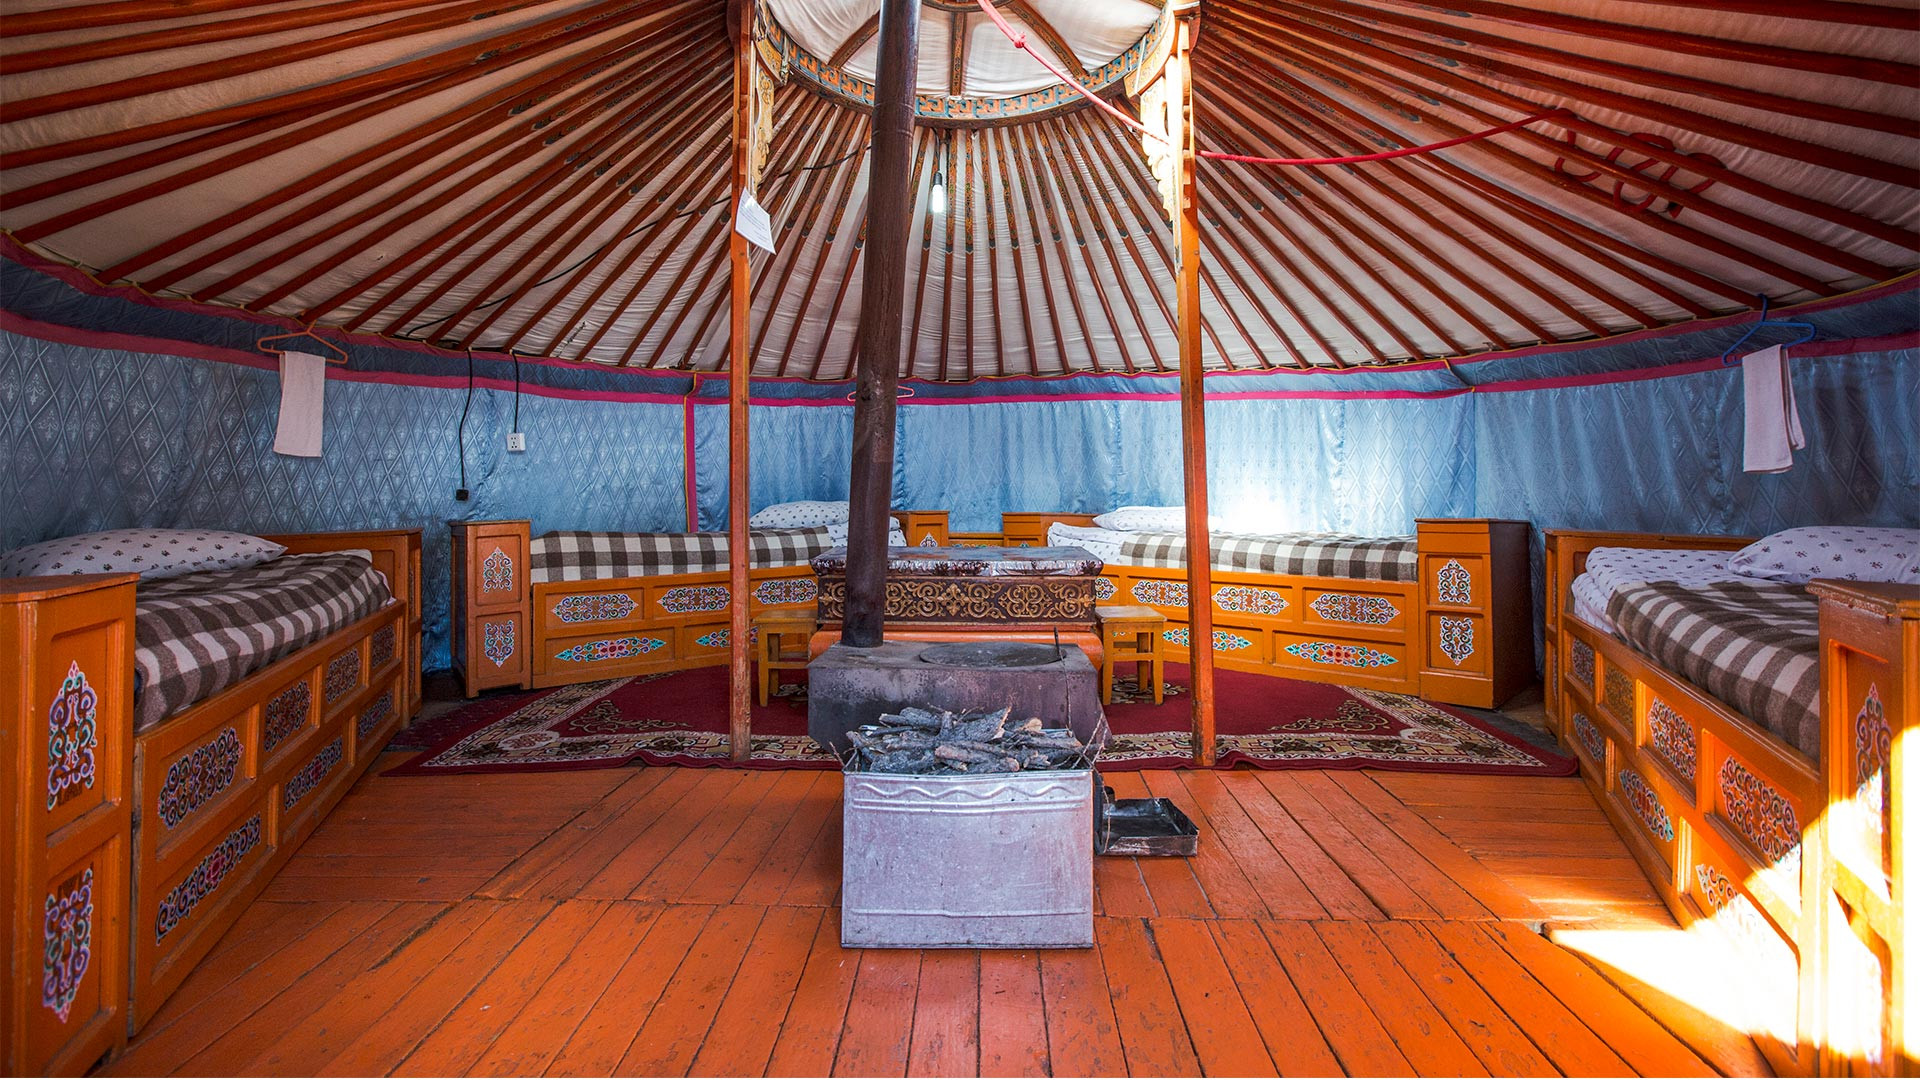 Yurt interior at G Adventures' nomadic life tour of Mongolia